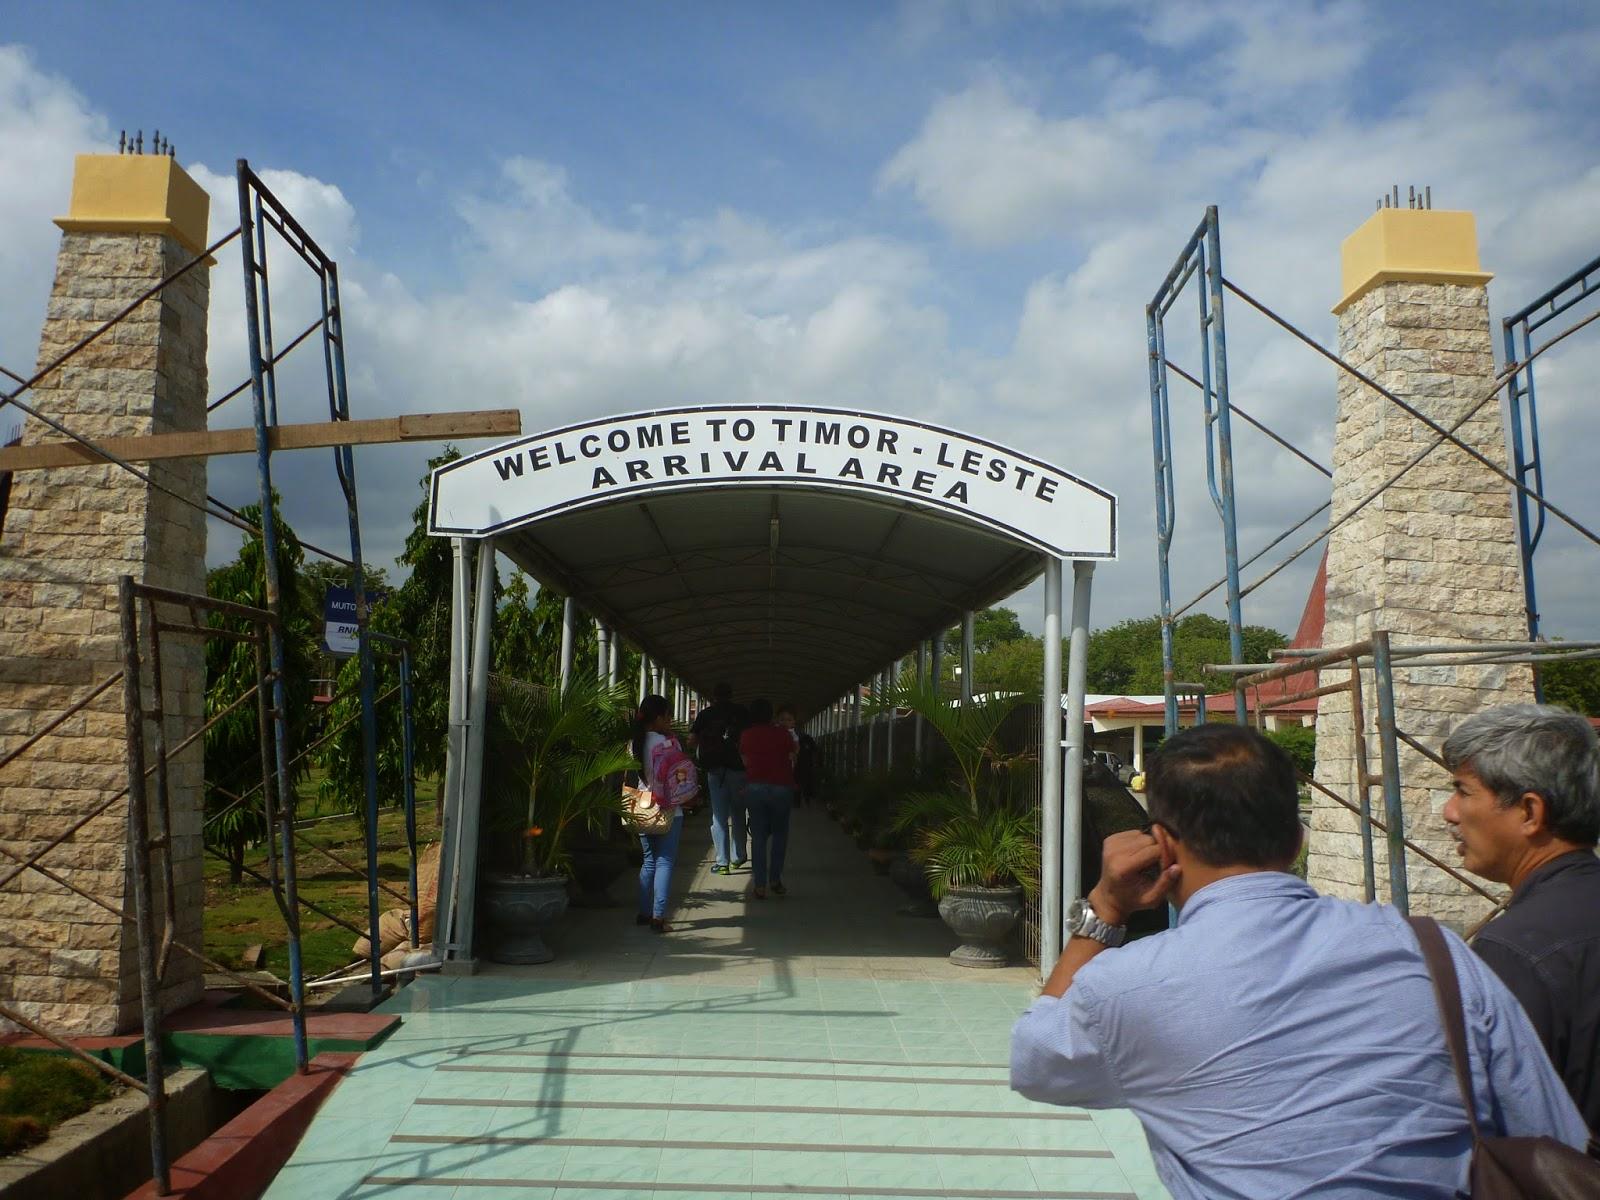 Aeroporto Dili : Agora é o momentum: timor leste díli 13 e 19 06 2014